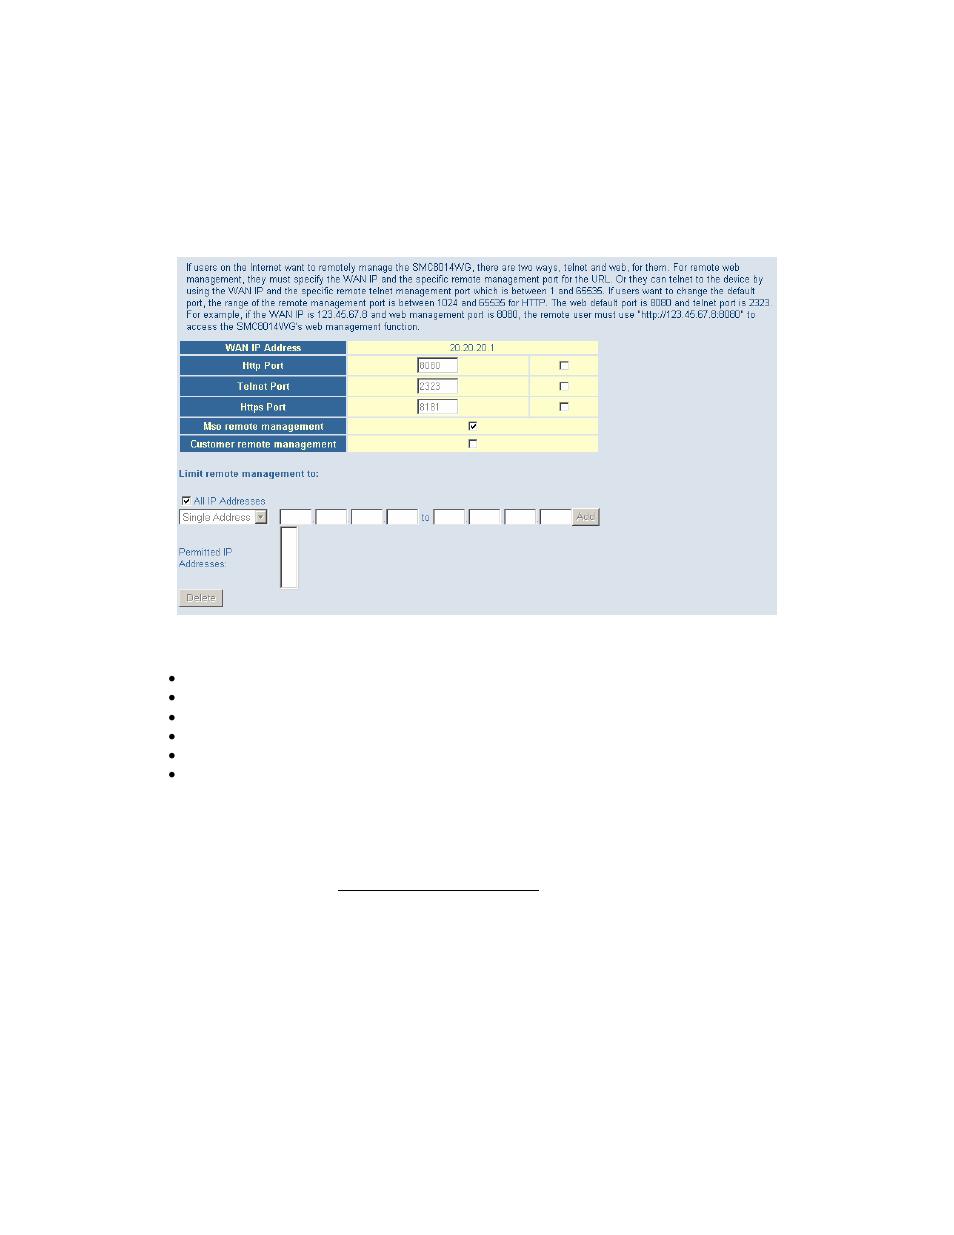 smc networks smc8014w g user manual page 17 60 original mode rh manualsdir com SMC8014W -G SMC SMC8014W-G Router Password